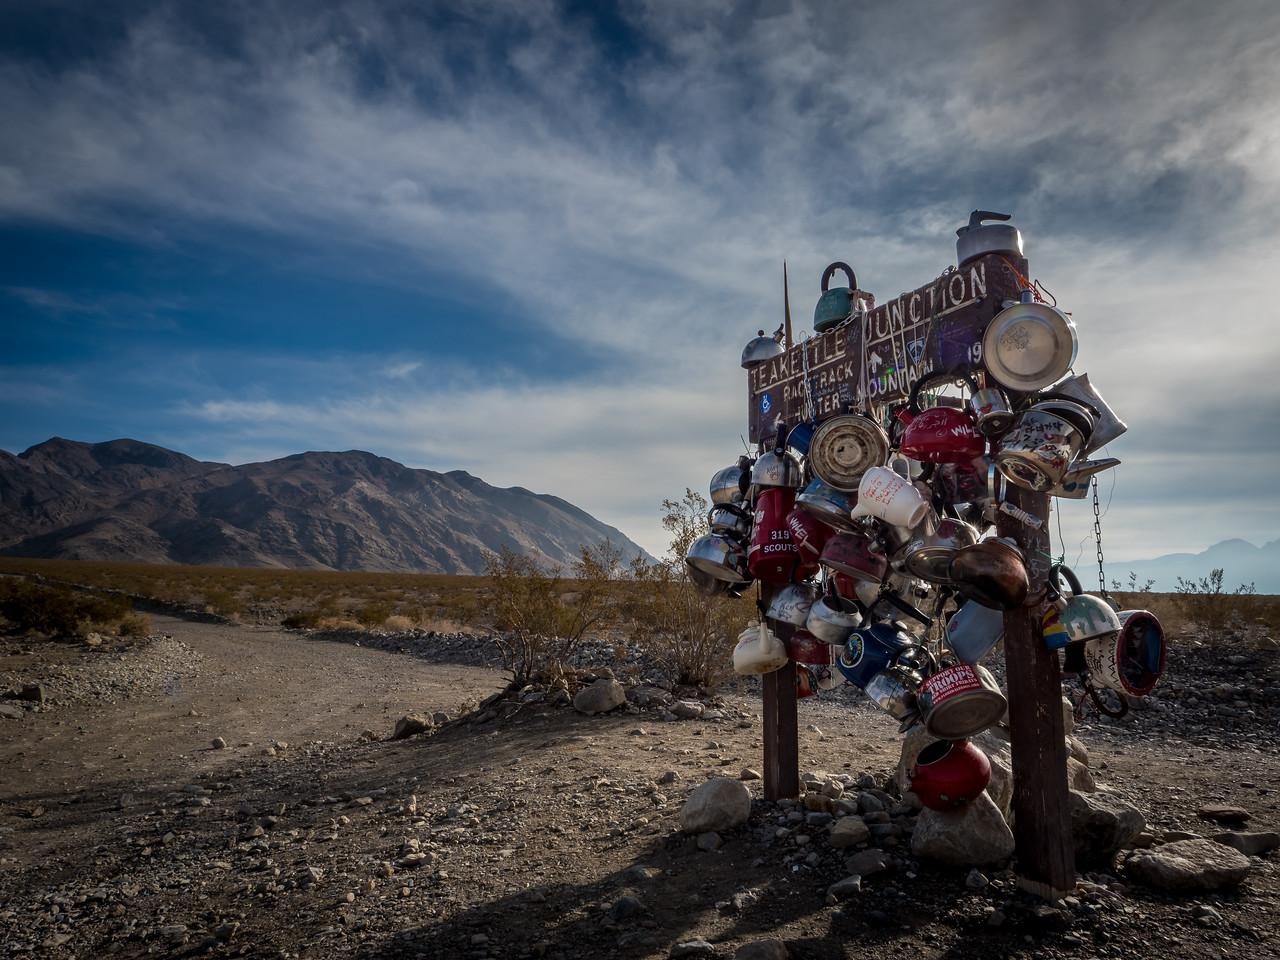 Teakettle Junction, Death Valley National Park, CA